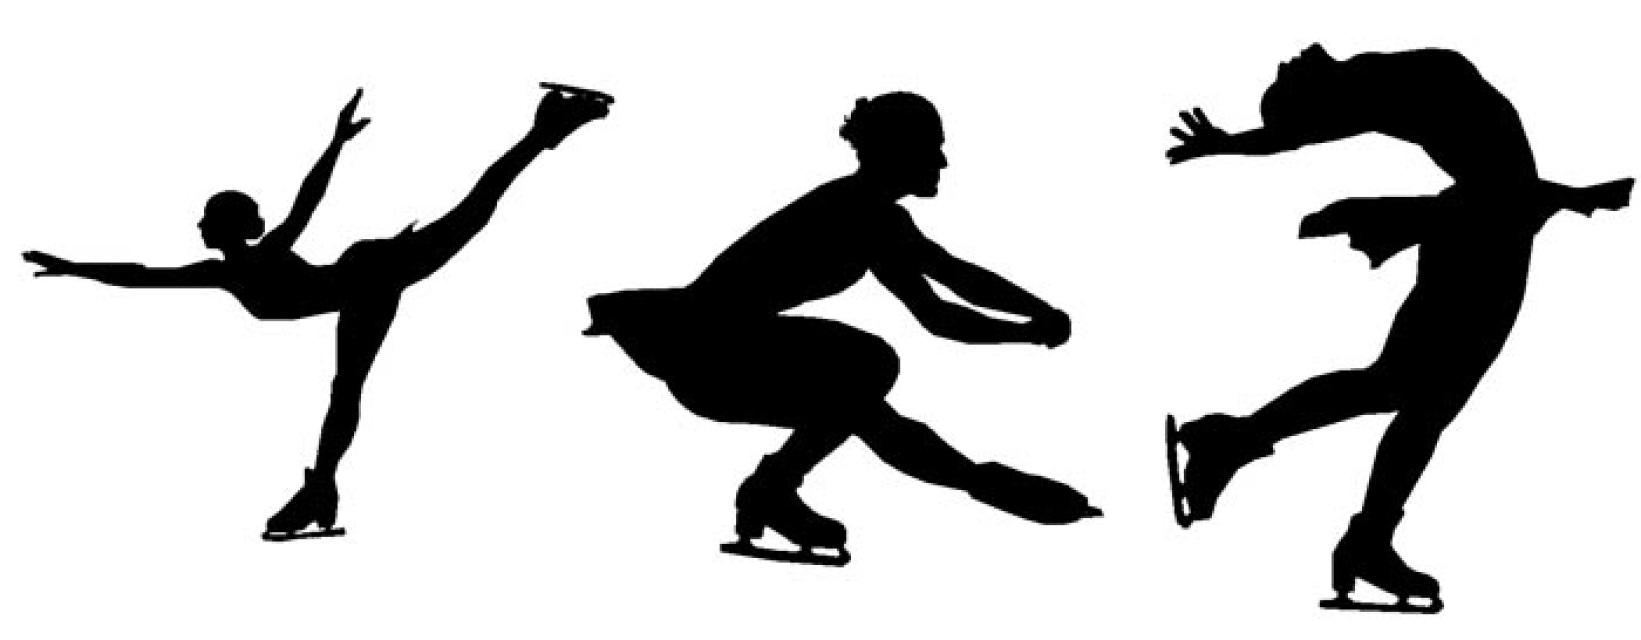 Spiral clipart figure skating Art Spiral skating Clip Family